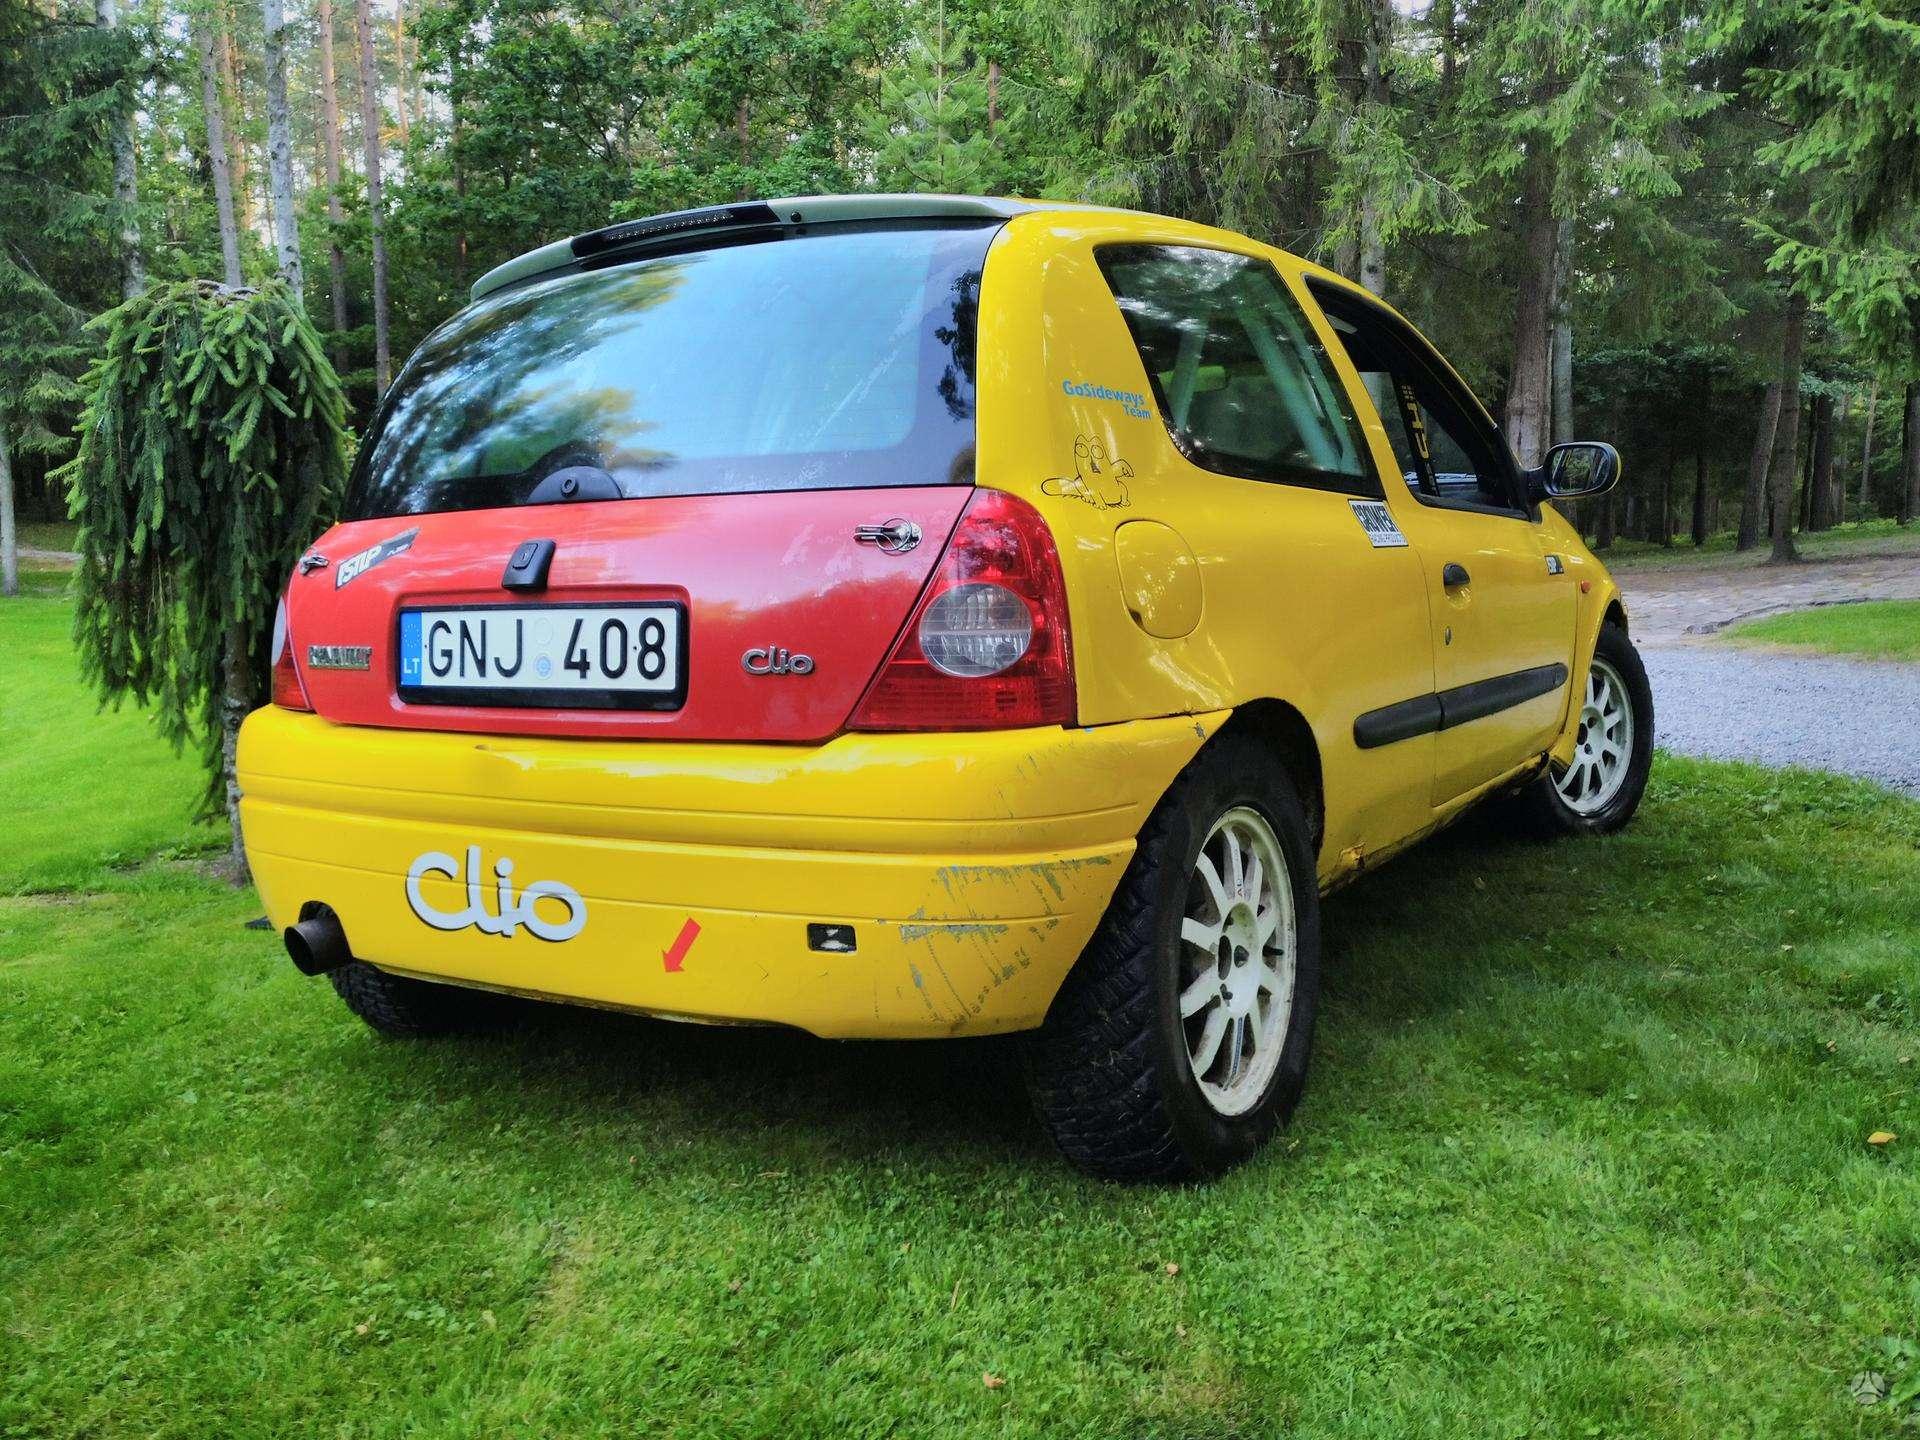 renault-clio-2-0-l-hecbekas-2001-benzinas (1).jpg